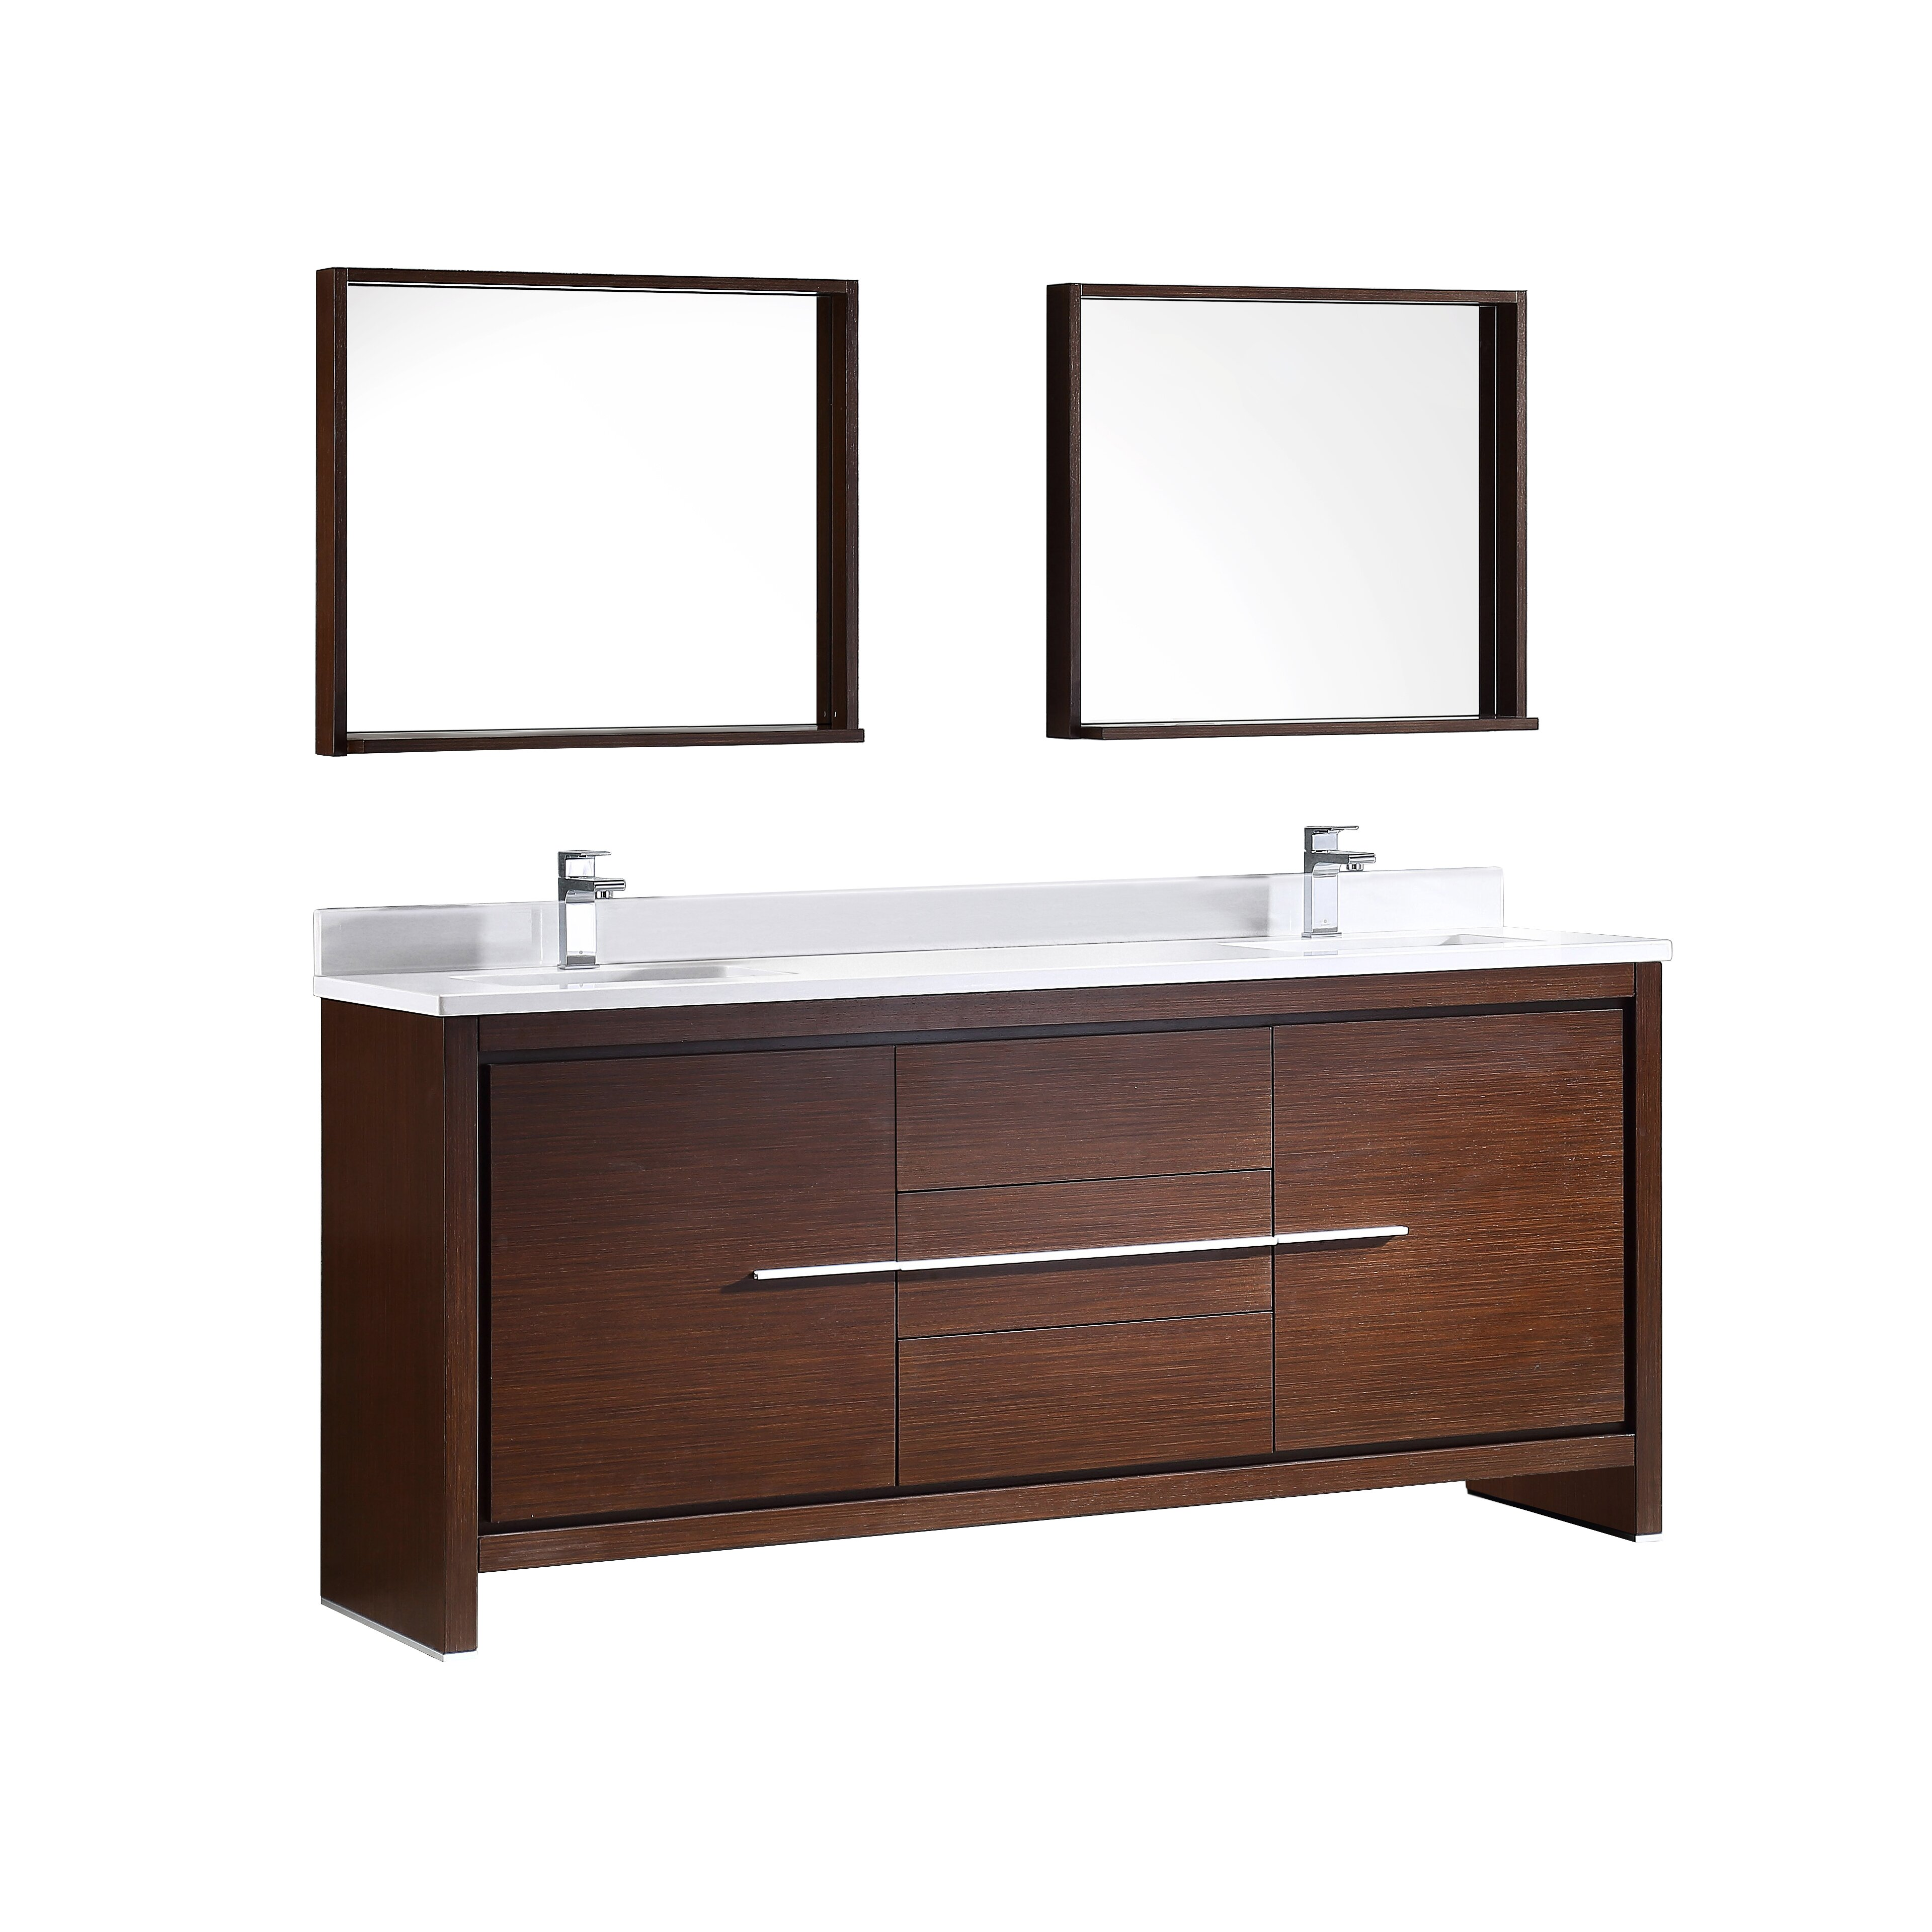 Fresca Trieste Allier 72 Double Modern Sink Bathroom Vanity Set With Mirror Reviews Wayfair